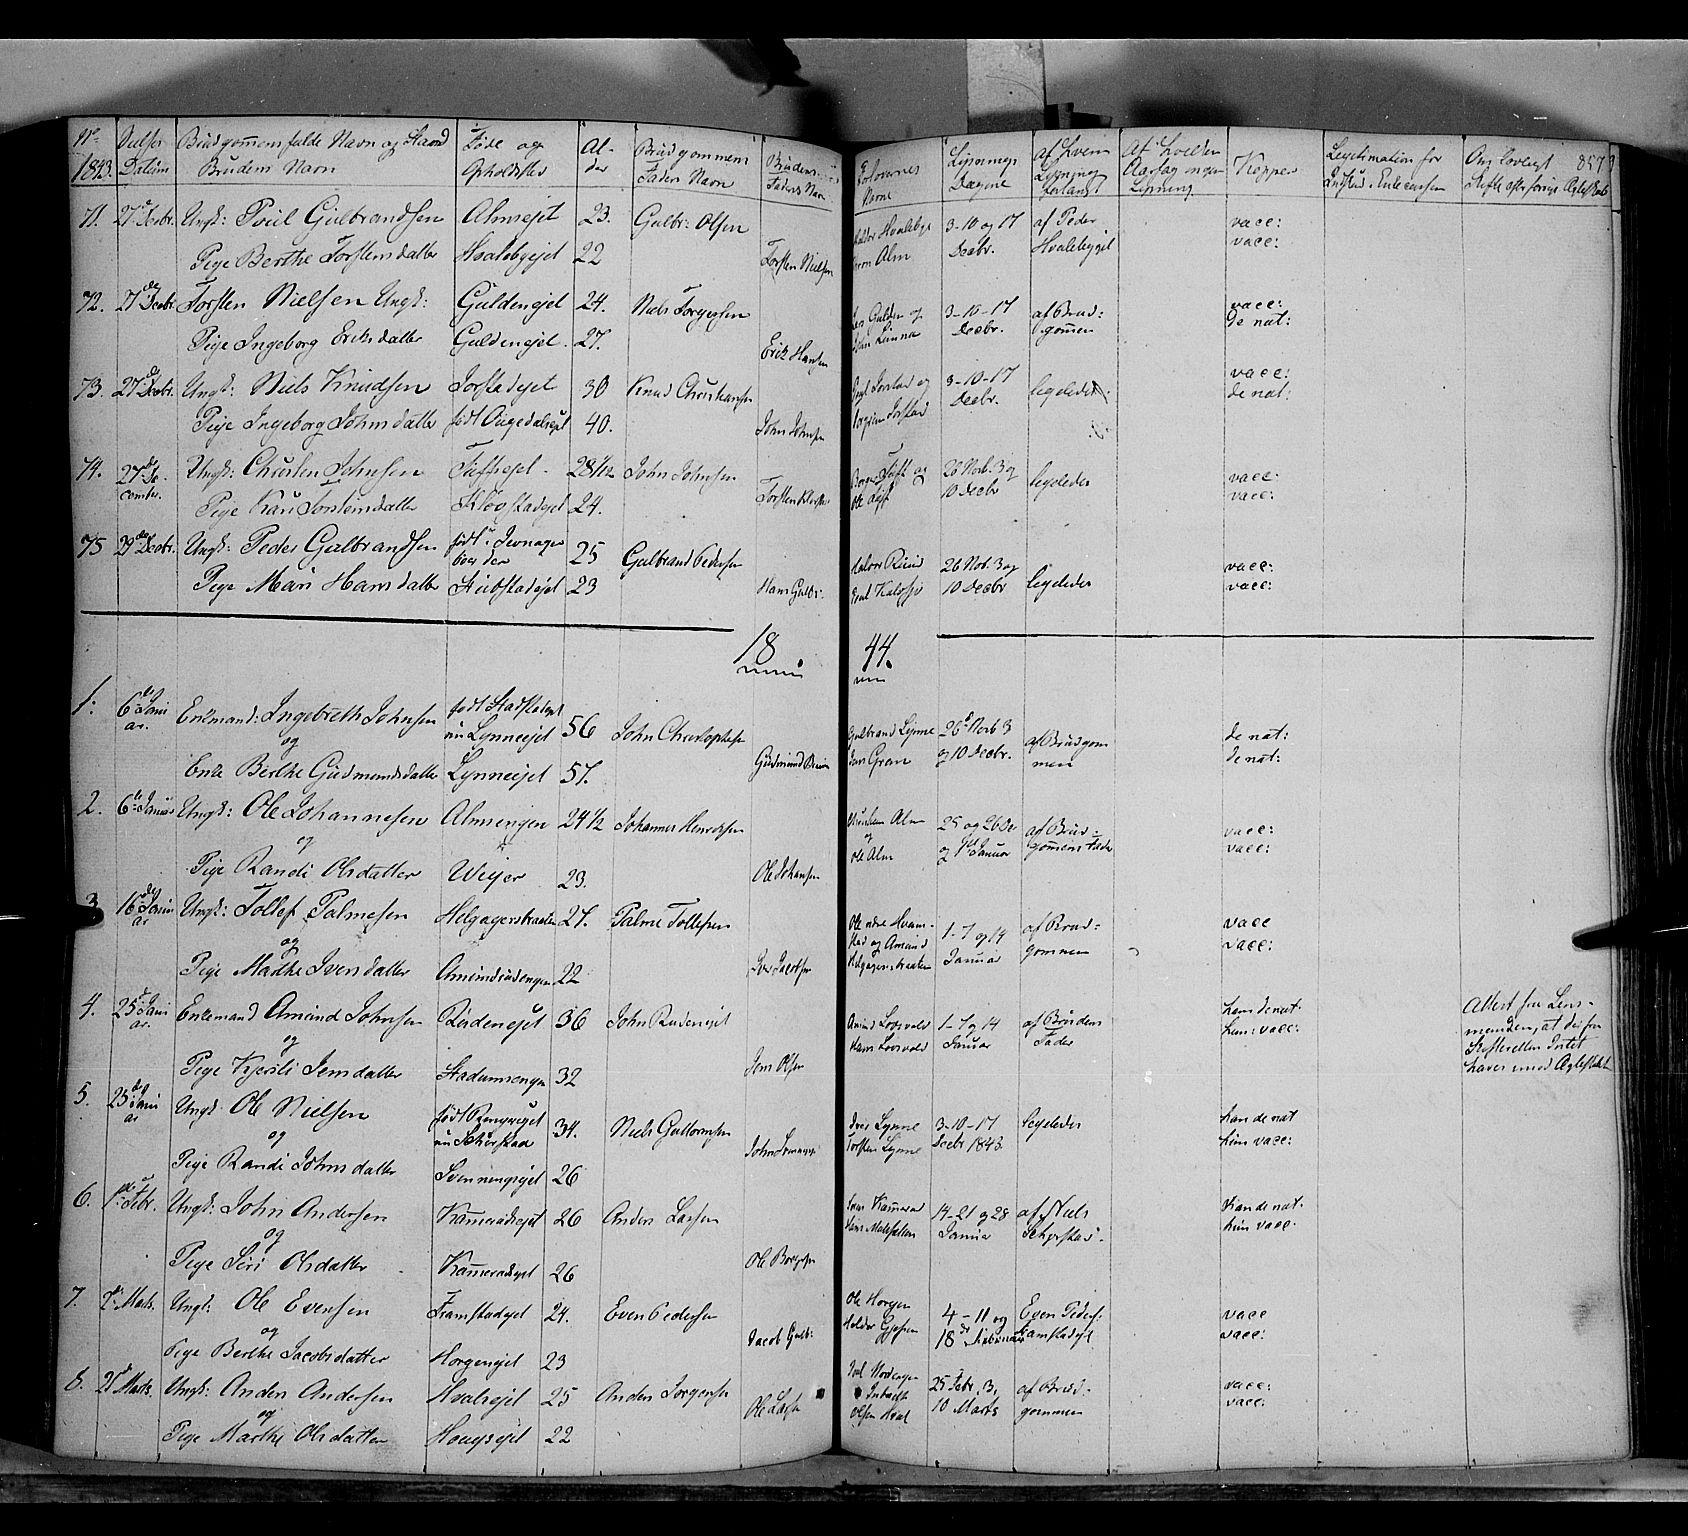 SAH, Gran prestekontor, Ministerialbok nr. 11, 1842-1856, s. 856-857